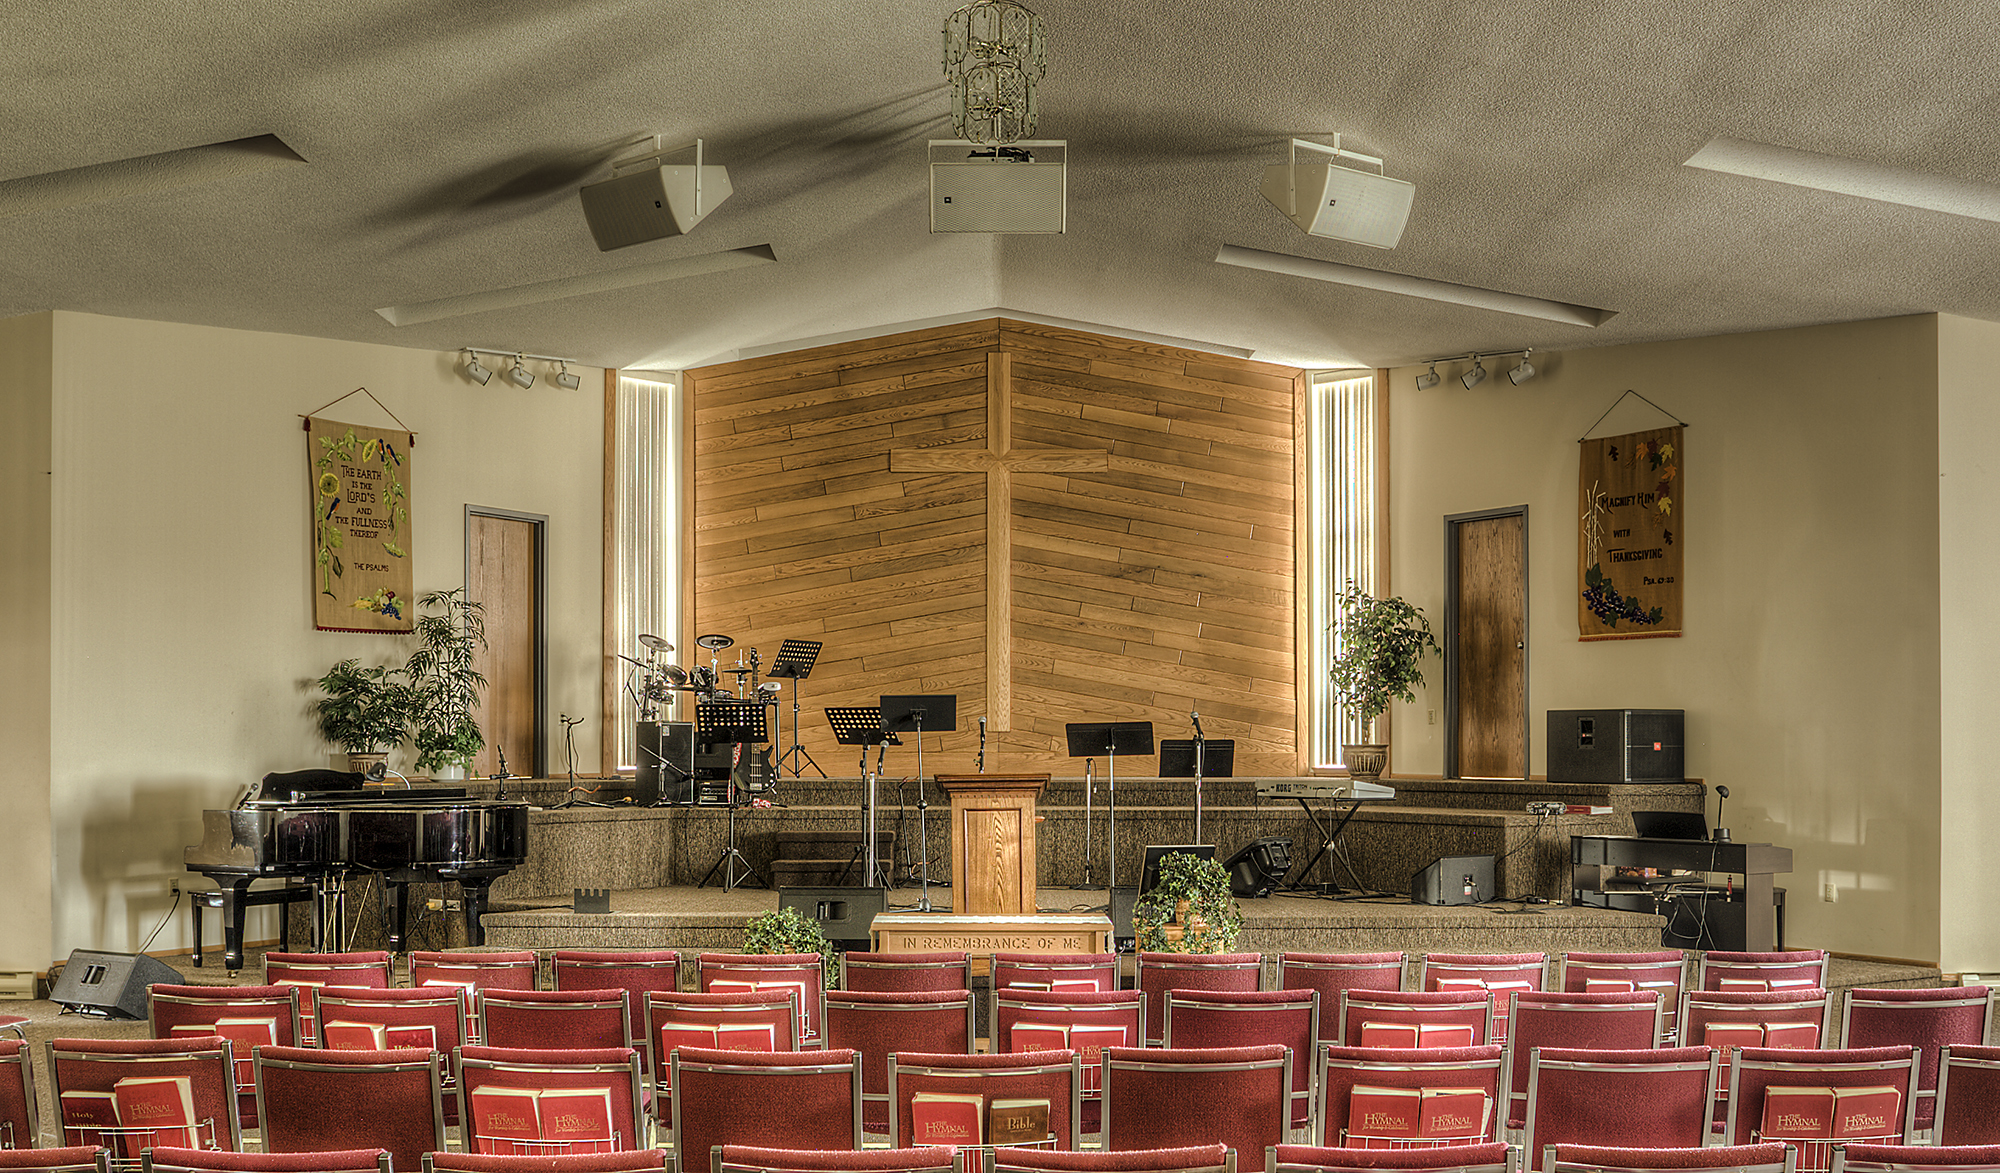 Church Ceiling Speakers Www Gradschoolfairs Com